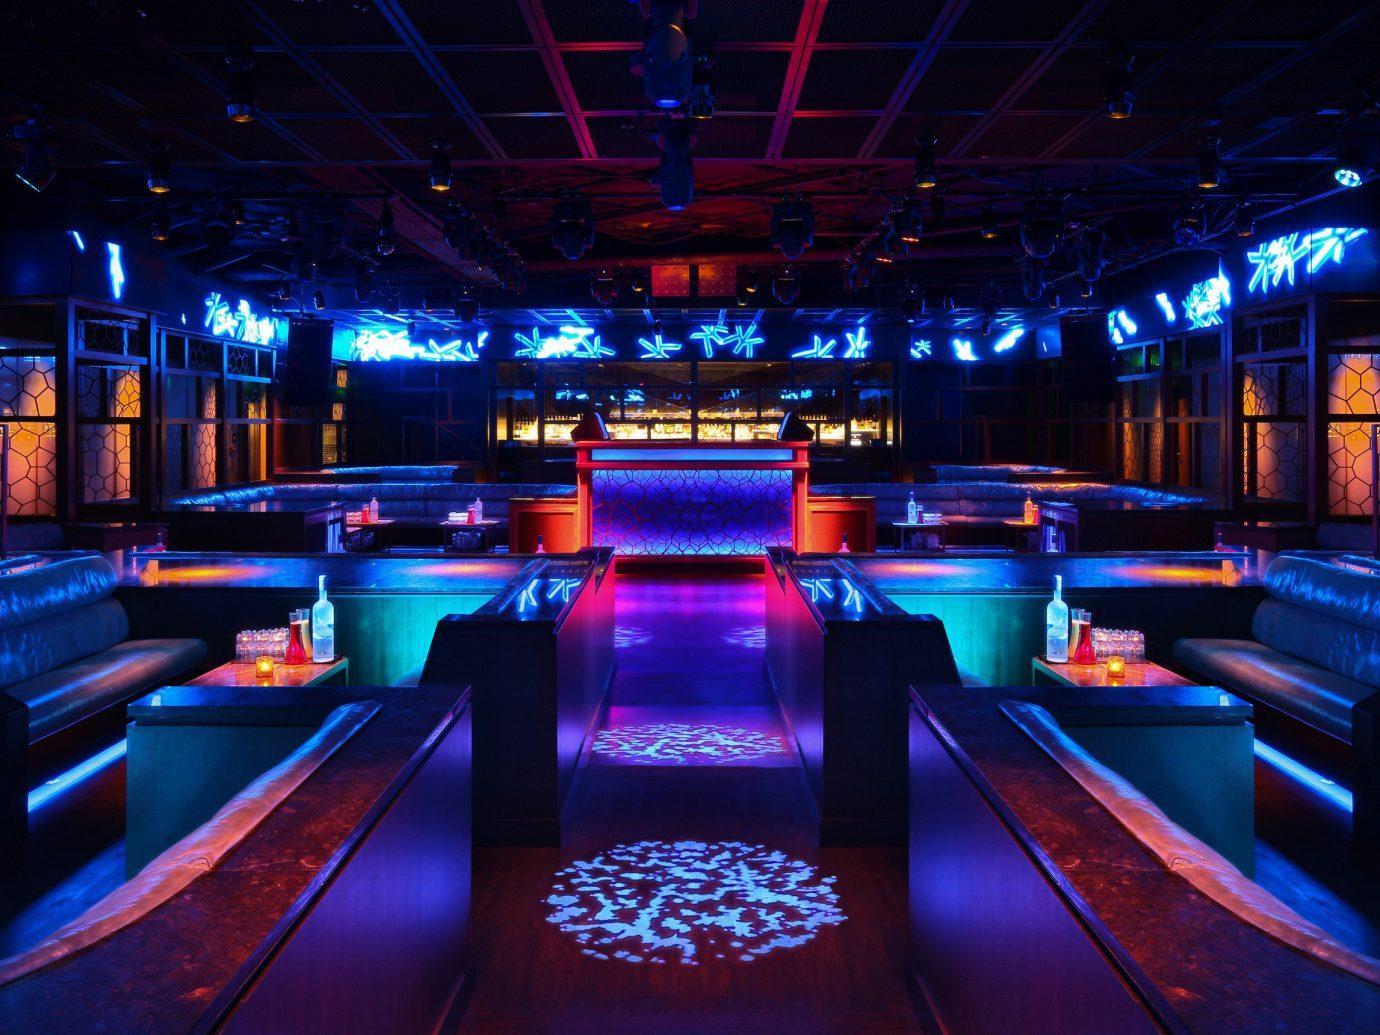 Trip Ideas indoor ceiling nightclub stage function hall auditorium music venue theatre Bar convention center